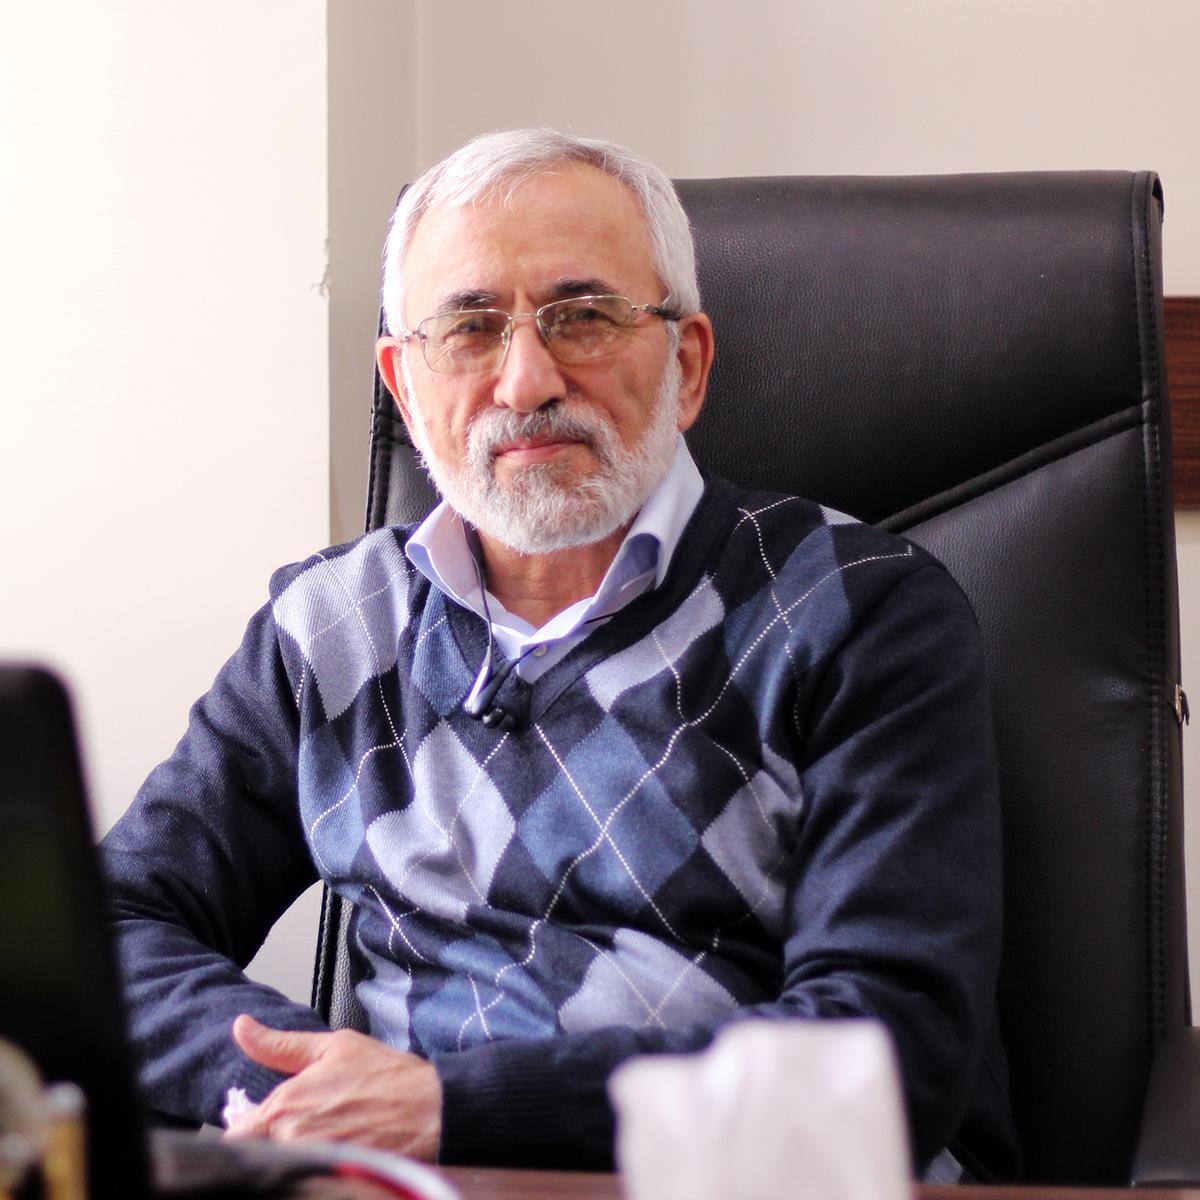 Hossein Rahmatizadeh